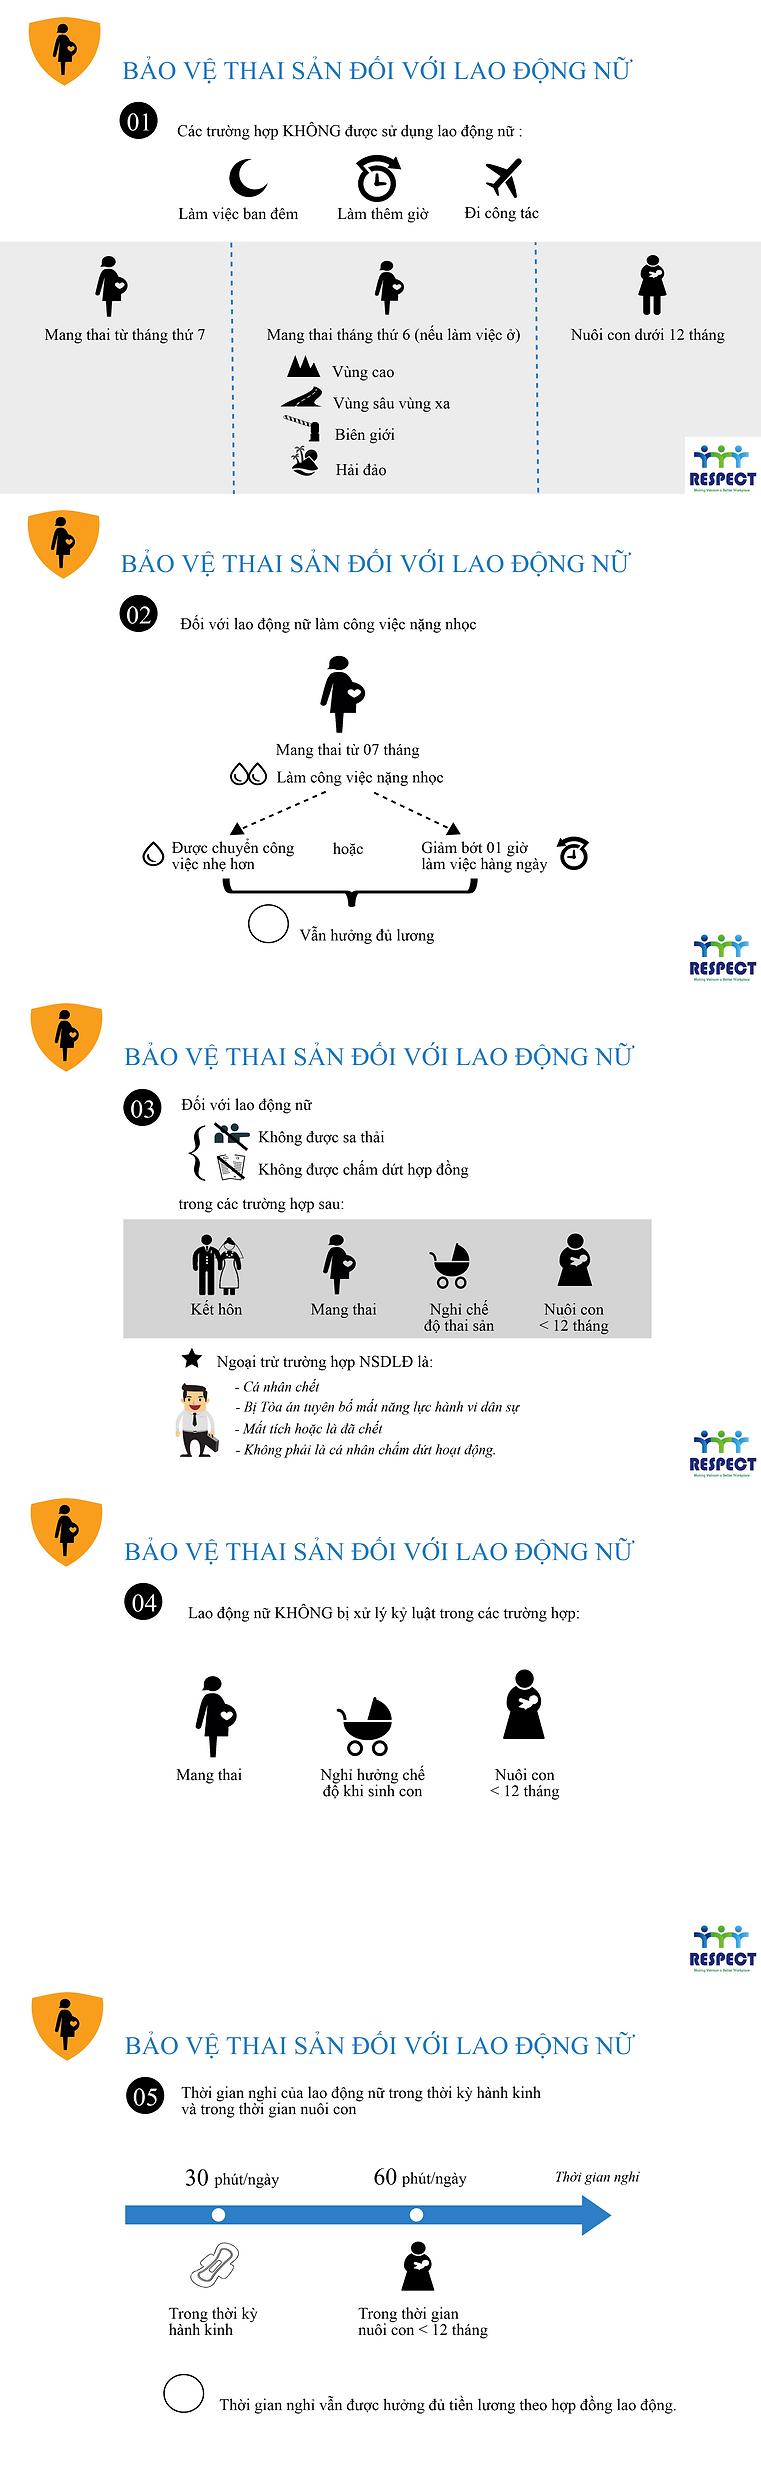 Article 155 Labor Law Vietnam.png